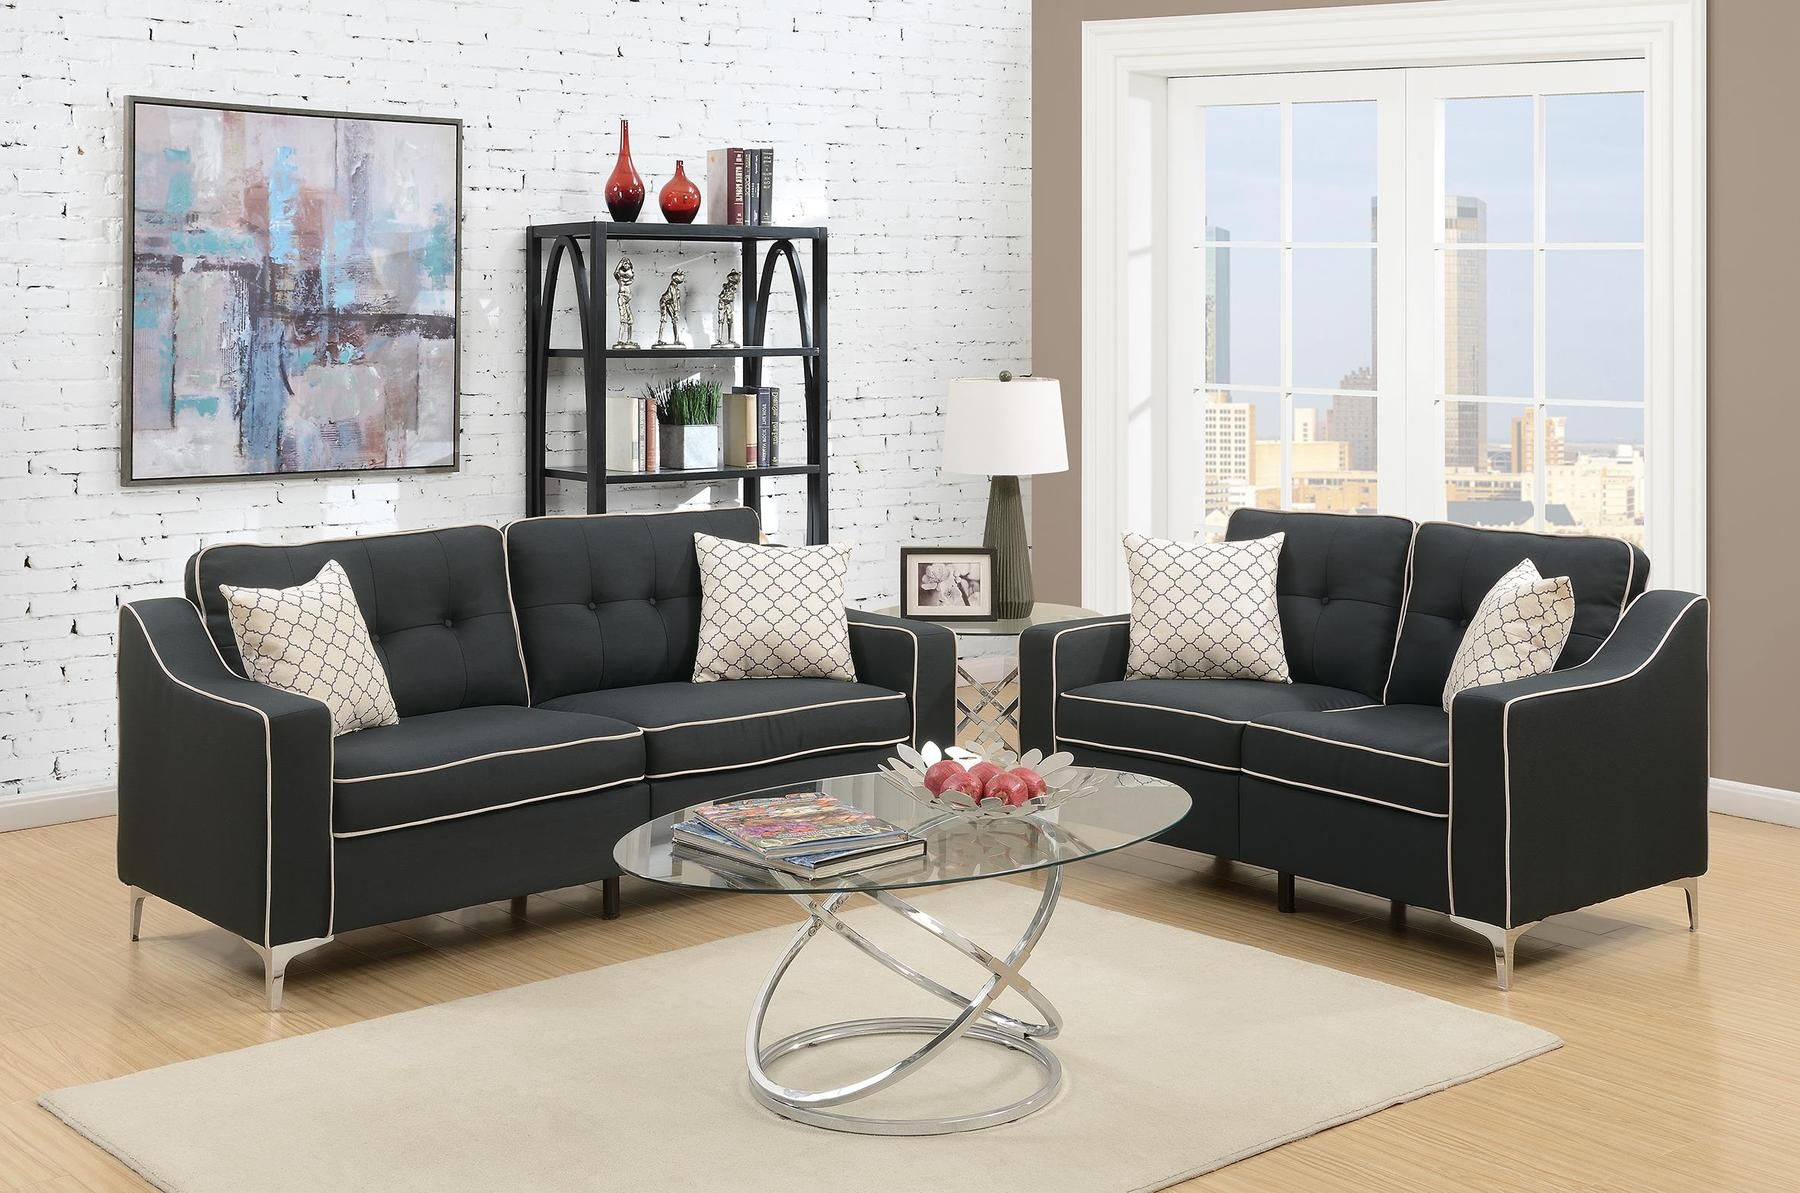 P6891 Sofa Loveseat F6891 Sebastian Poundex Fabric Sofas Sofa And Loveseat Set Living Room Sets Love Seat